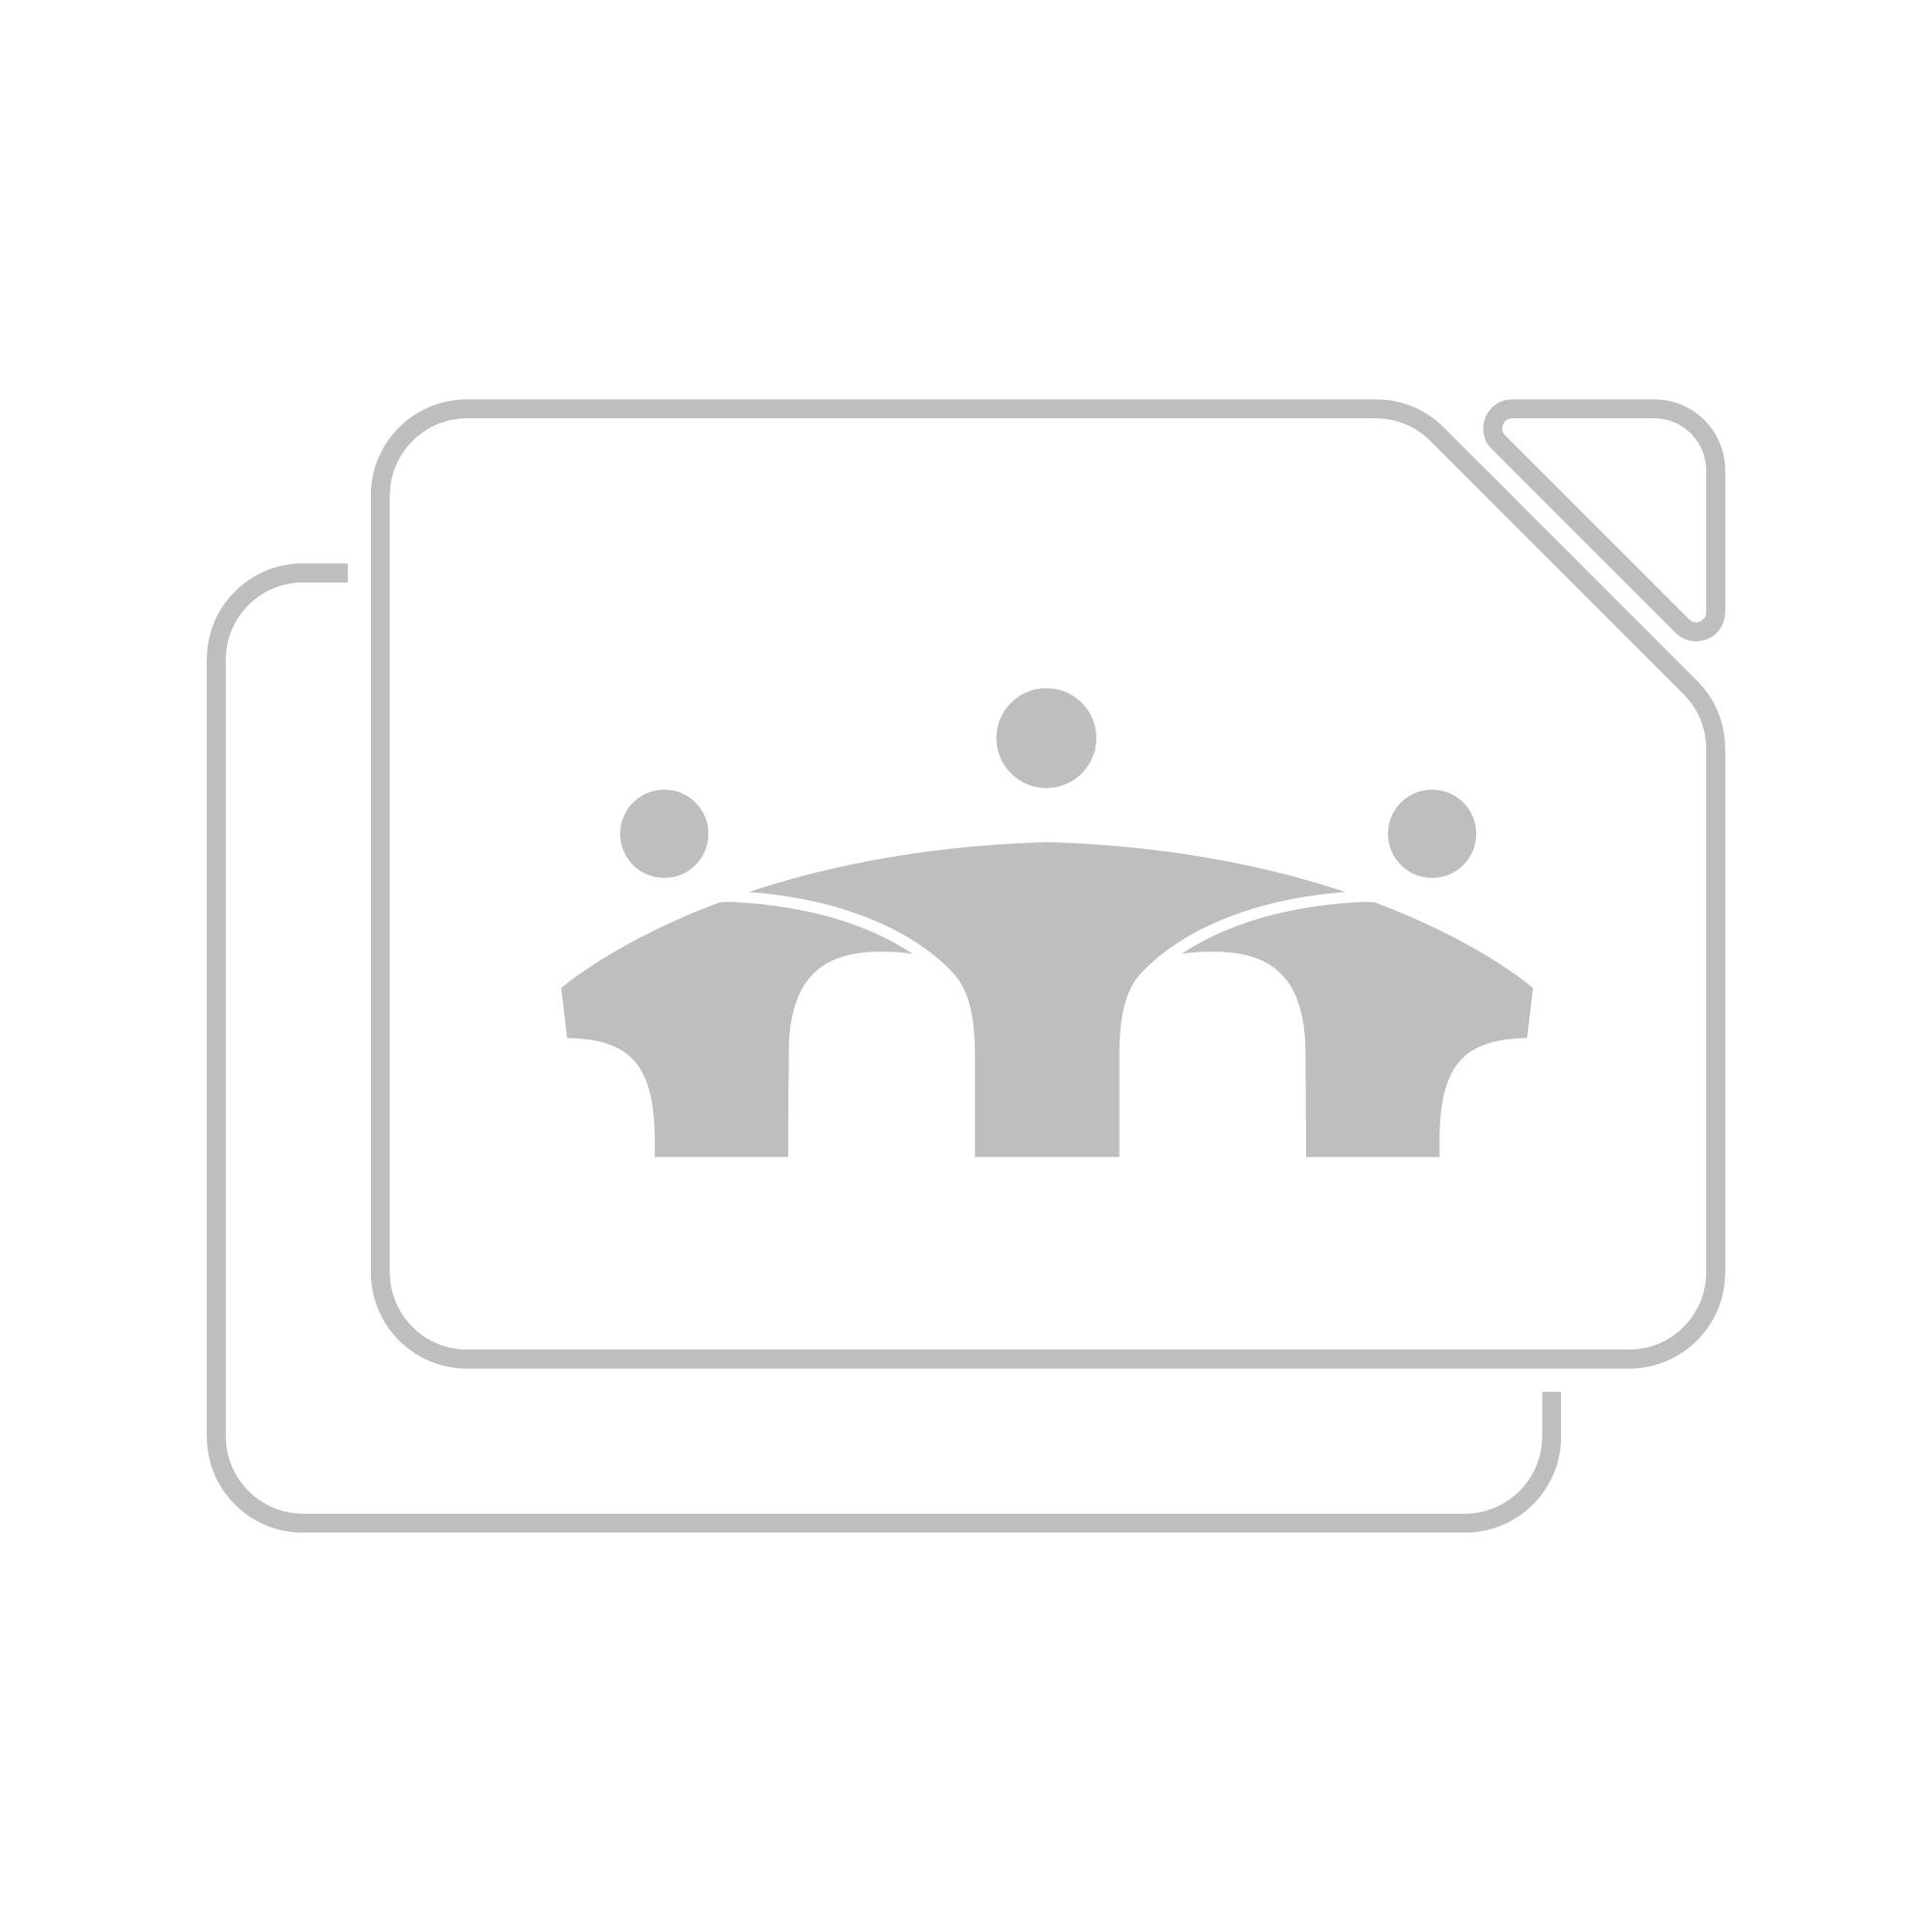 AMD Ryzen 7 5700G - 4.6GHz (Tray)